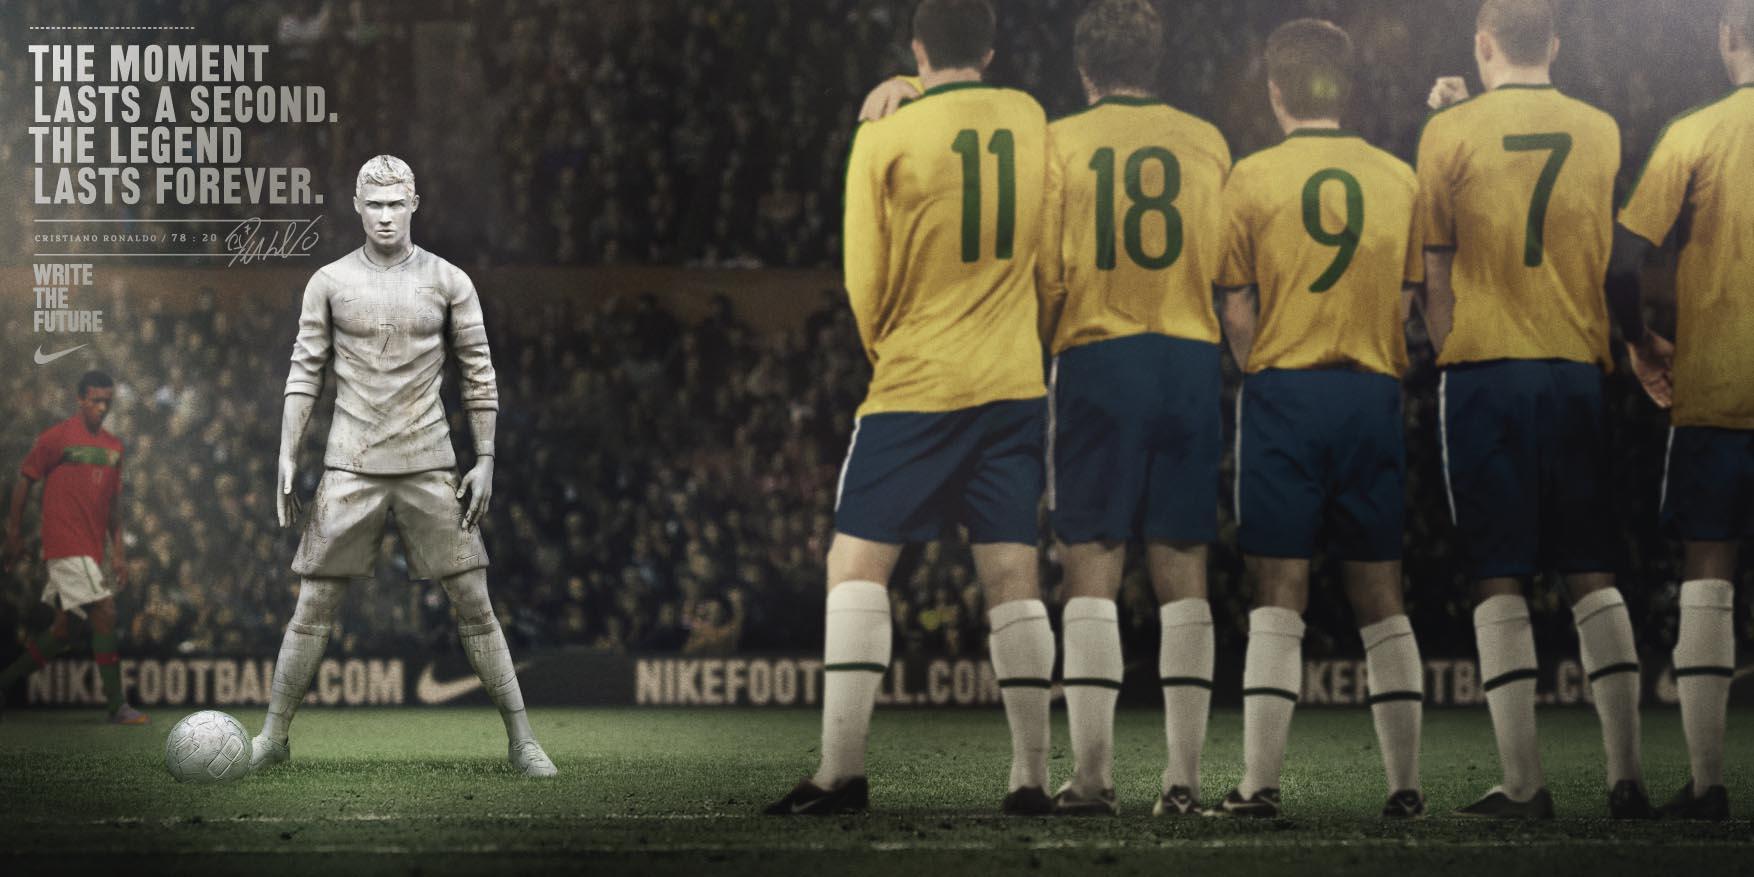 http://www.ibelieveinadv.com/commons/nike_write_future_Ronaldo.jpg